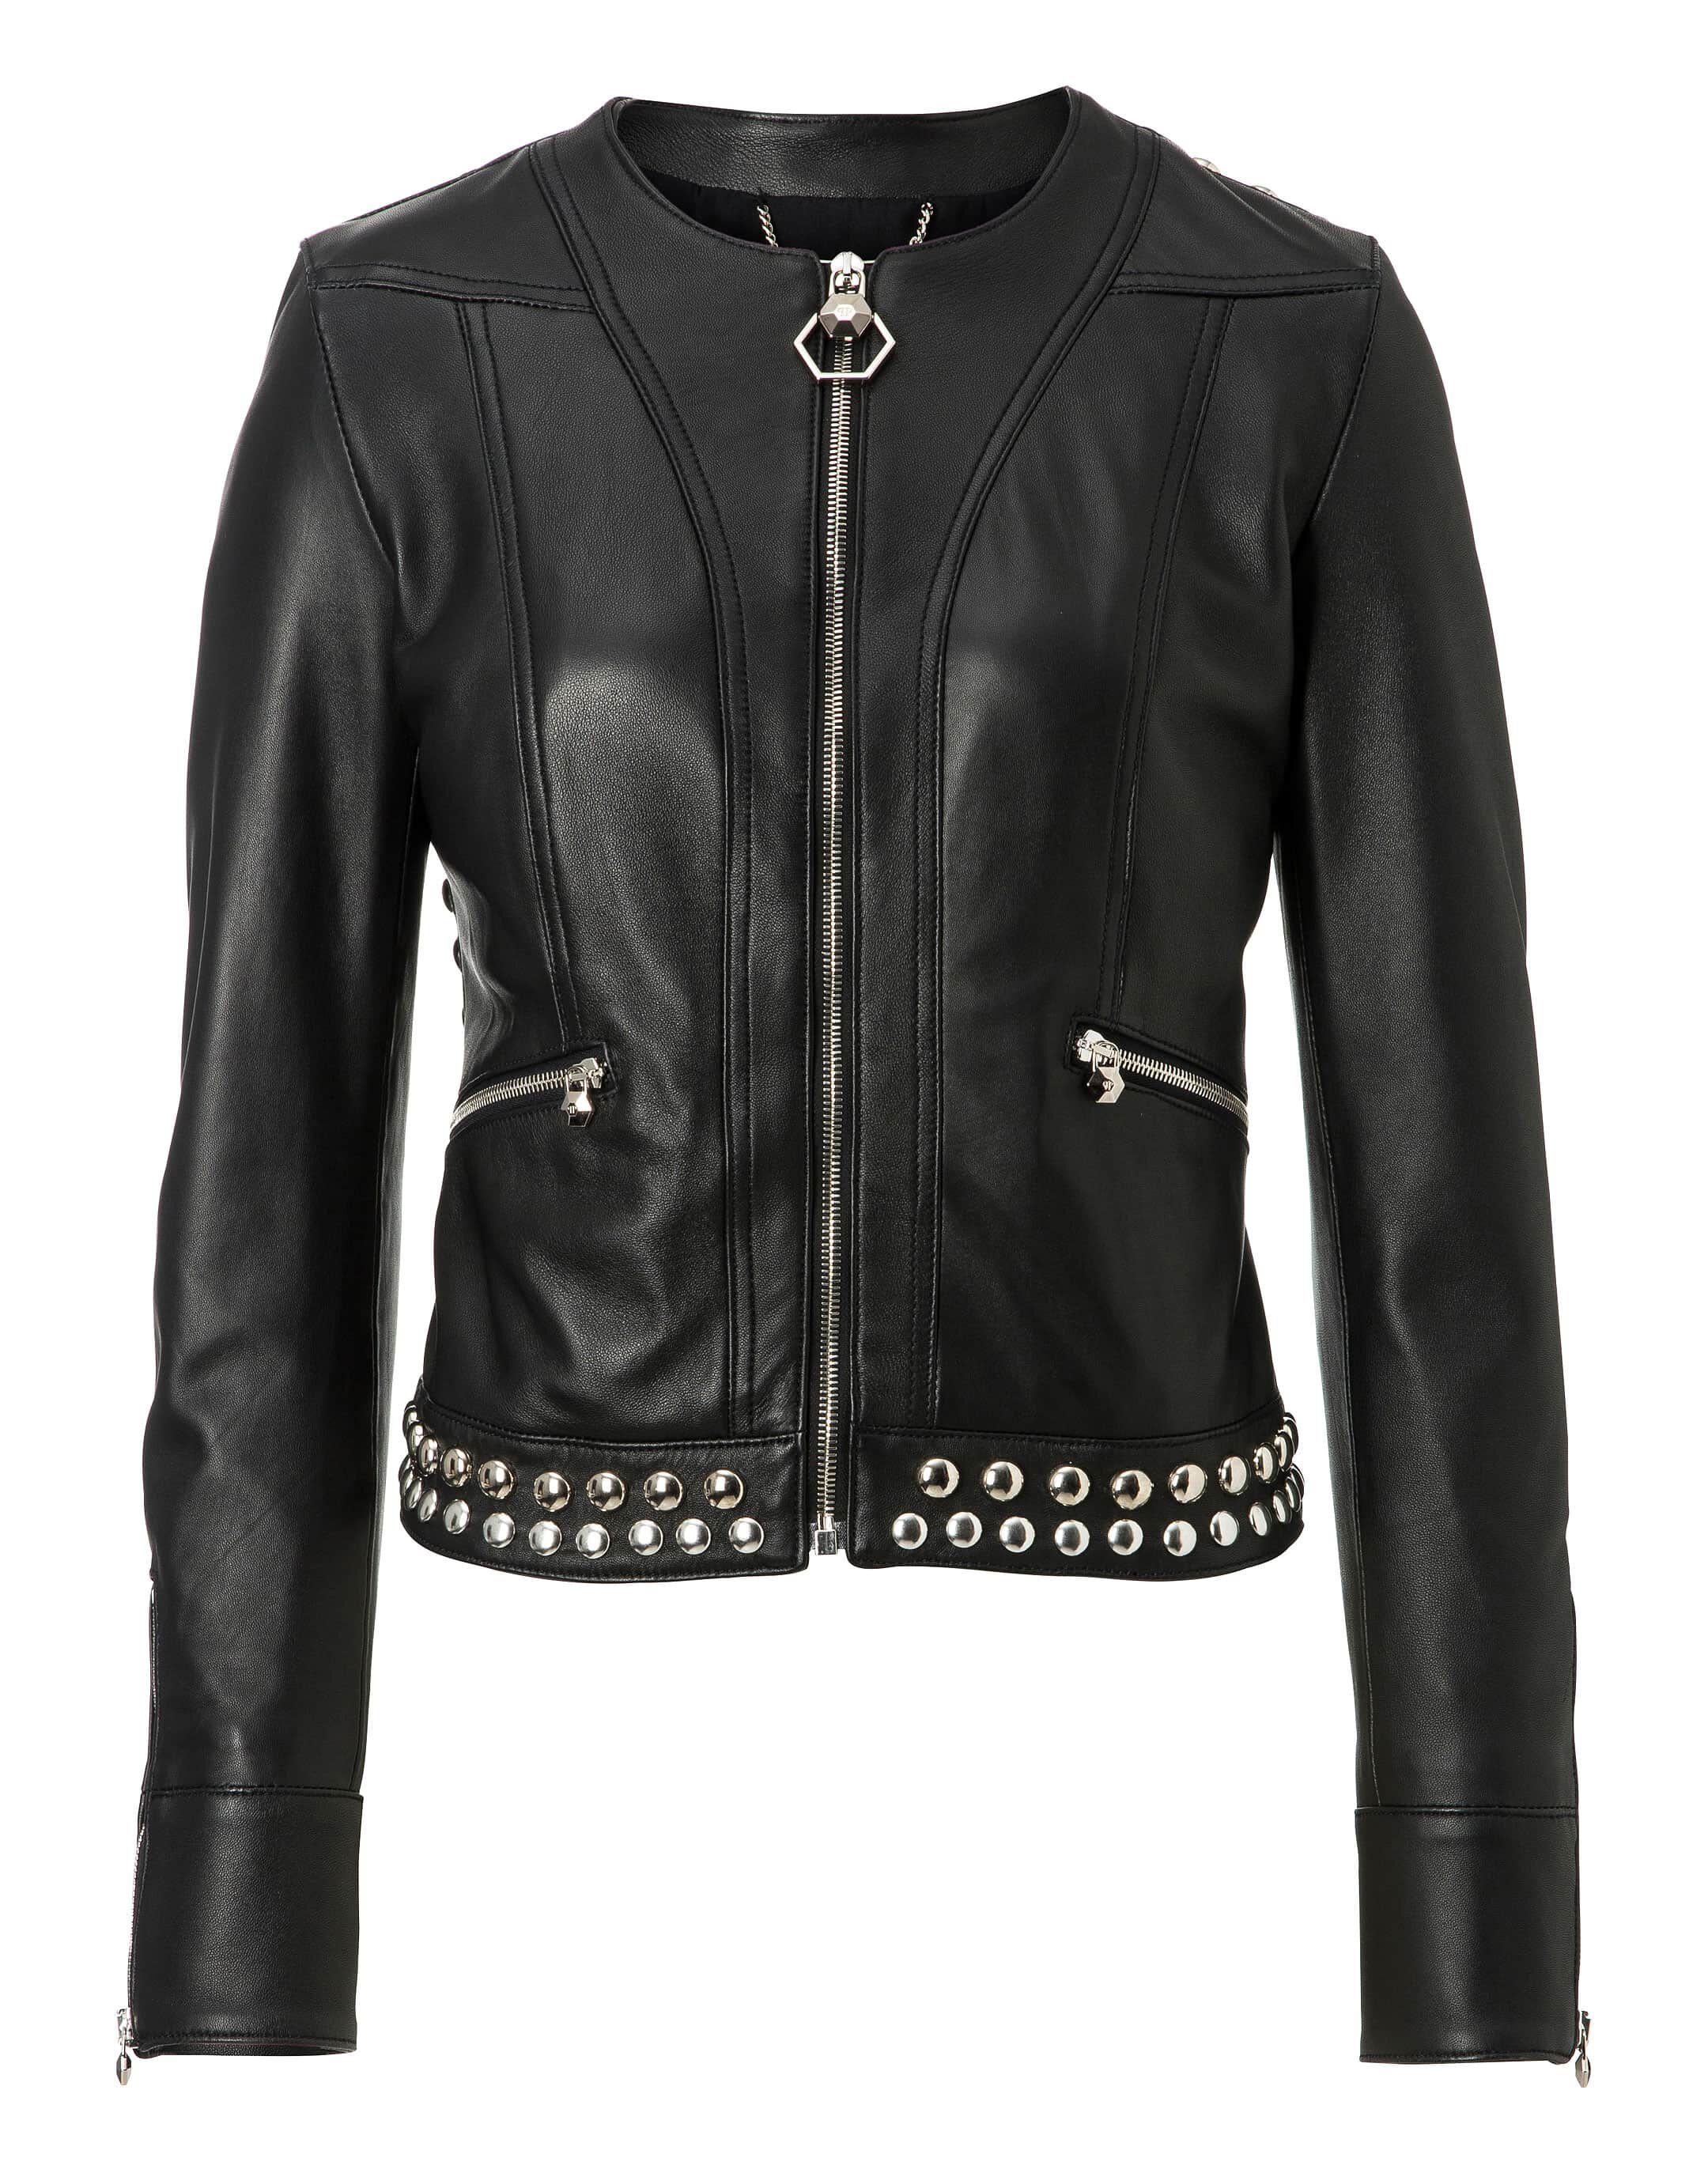 Ladies leather jackets kenya